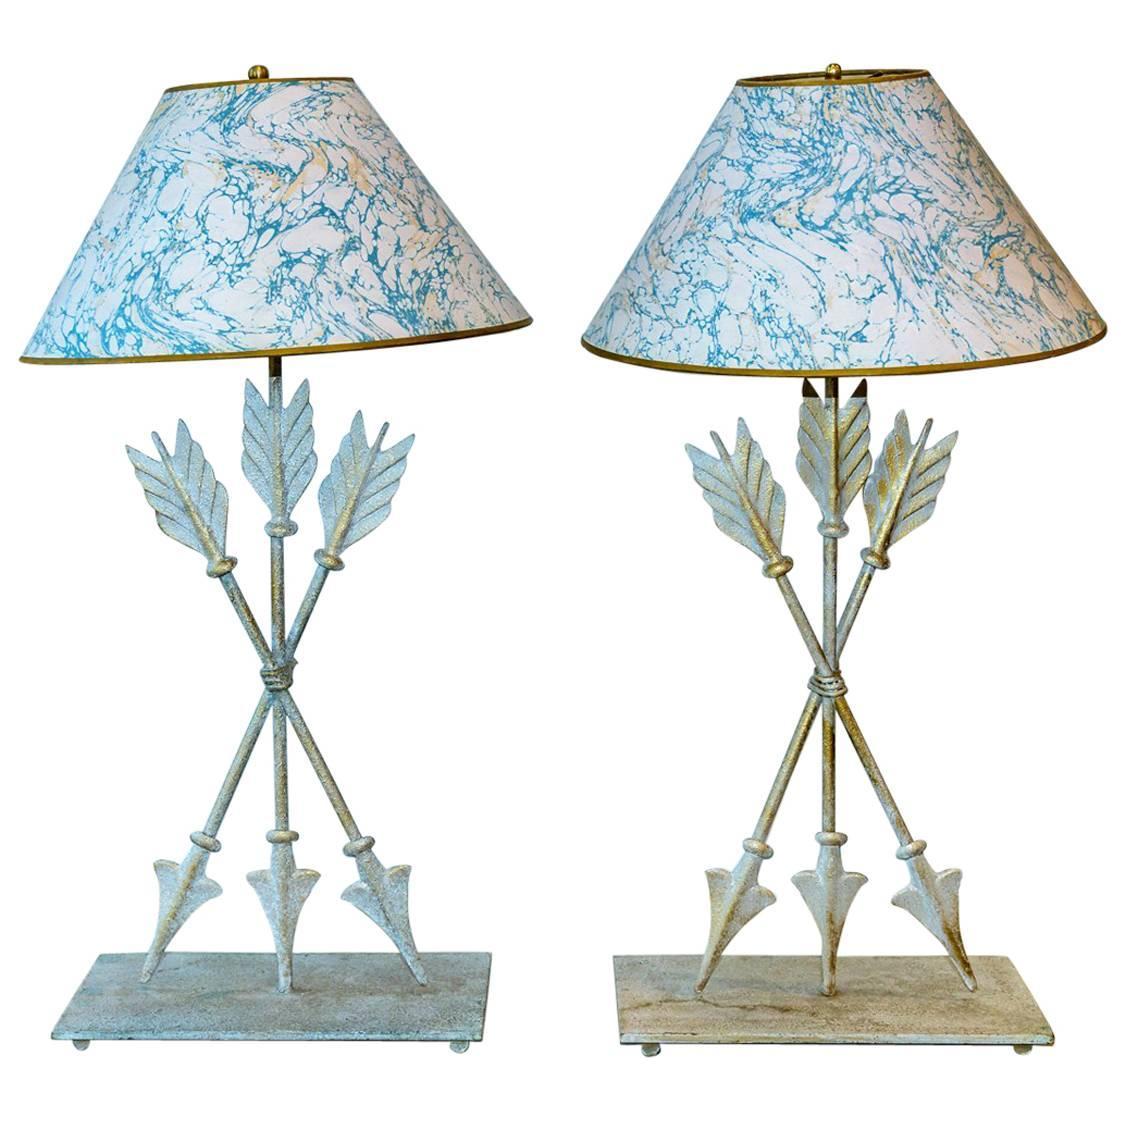 Pair of Italian Mid- Century Painted Tole Arrow Lamps